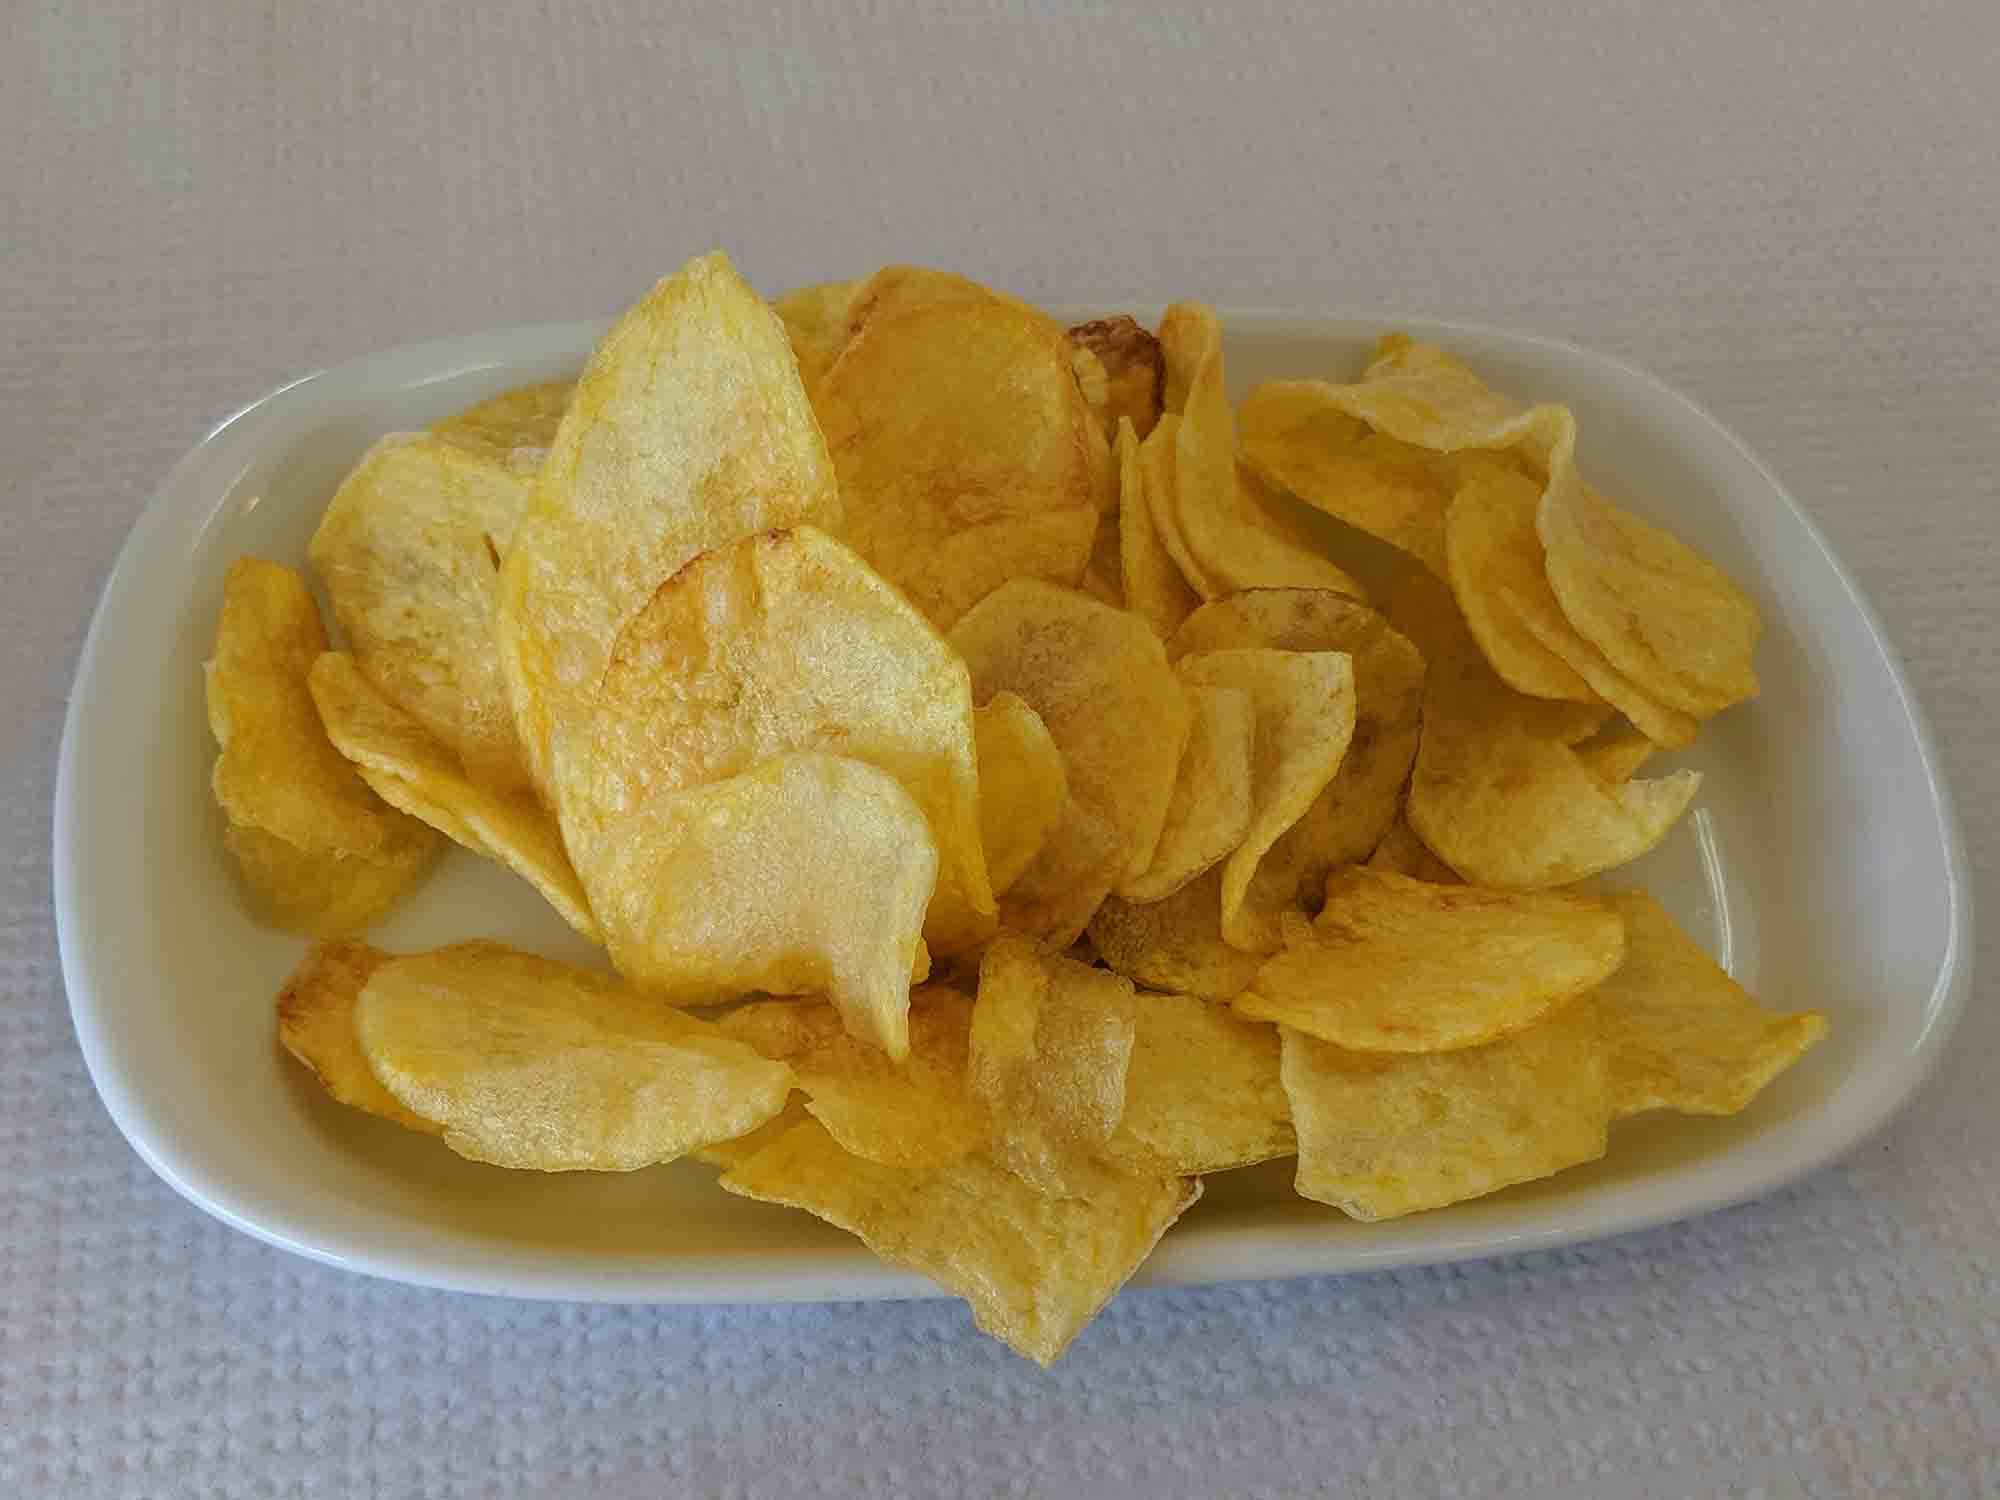 leitao crisps